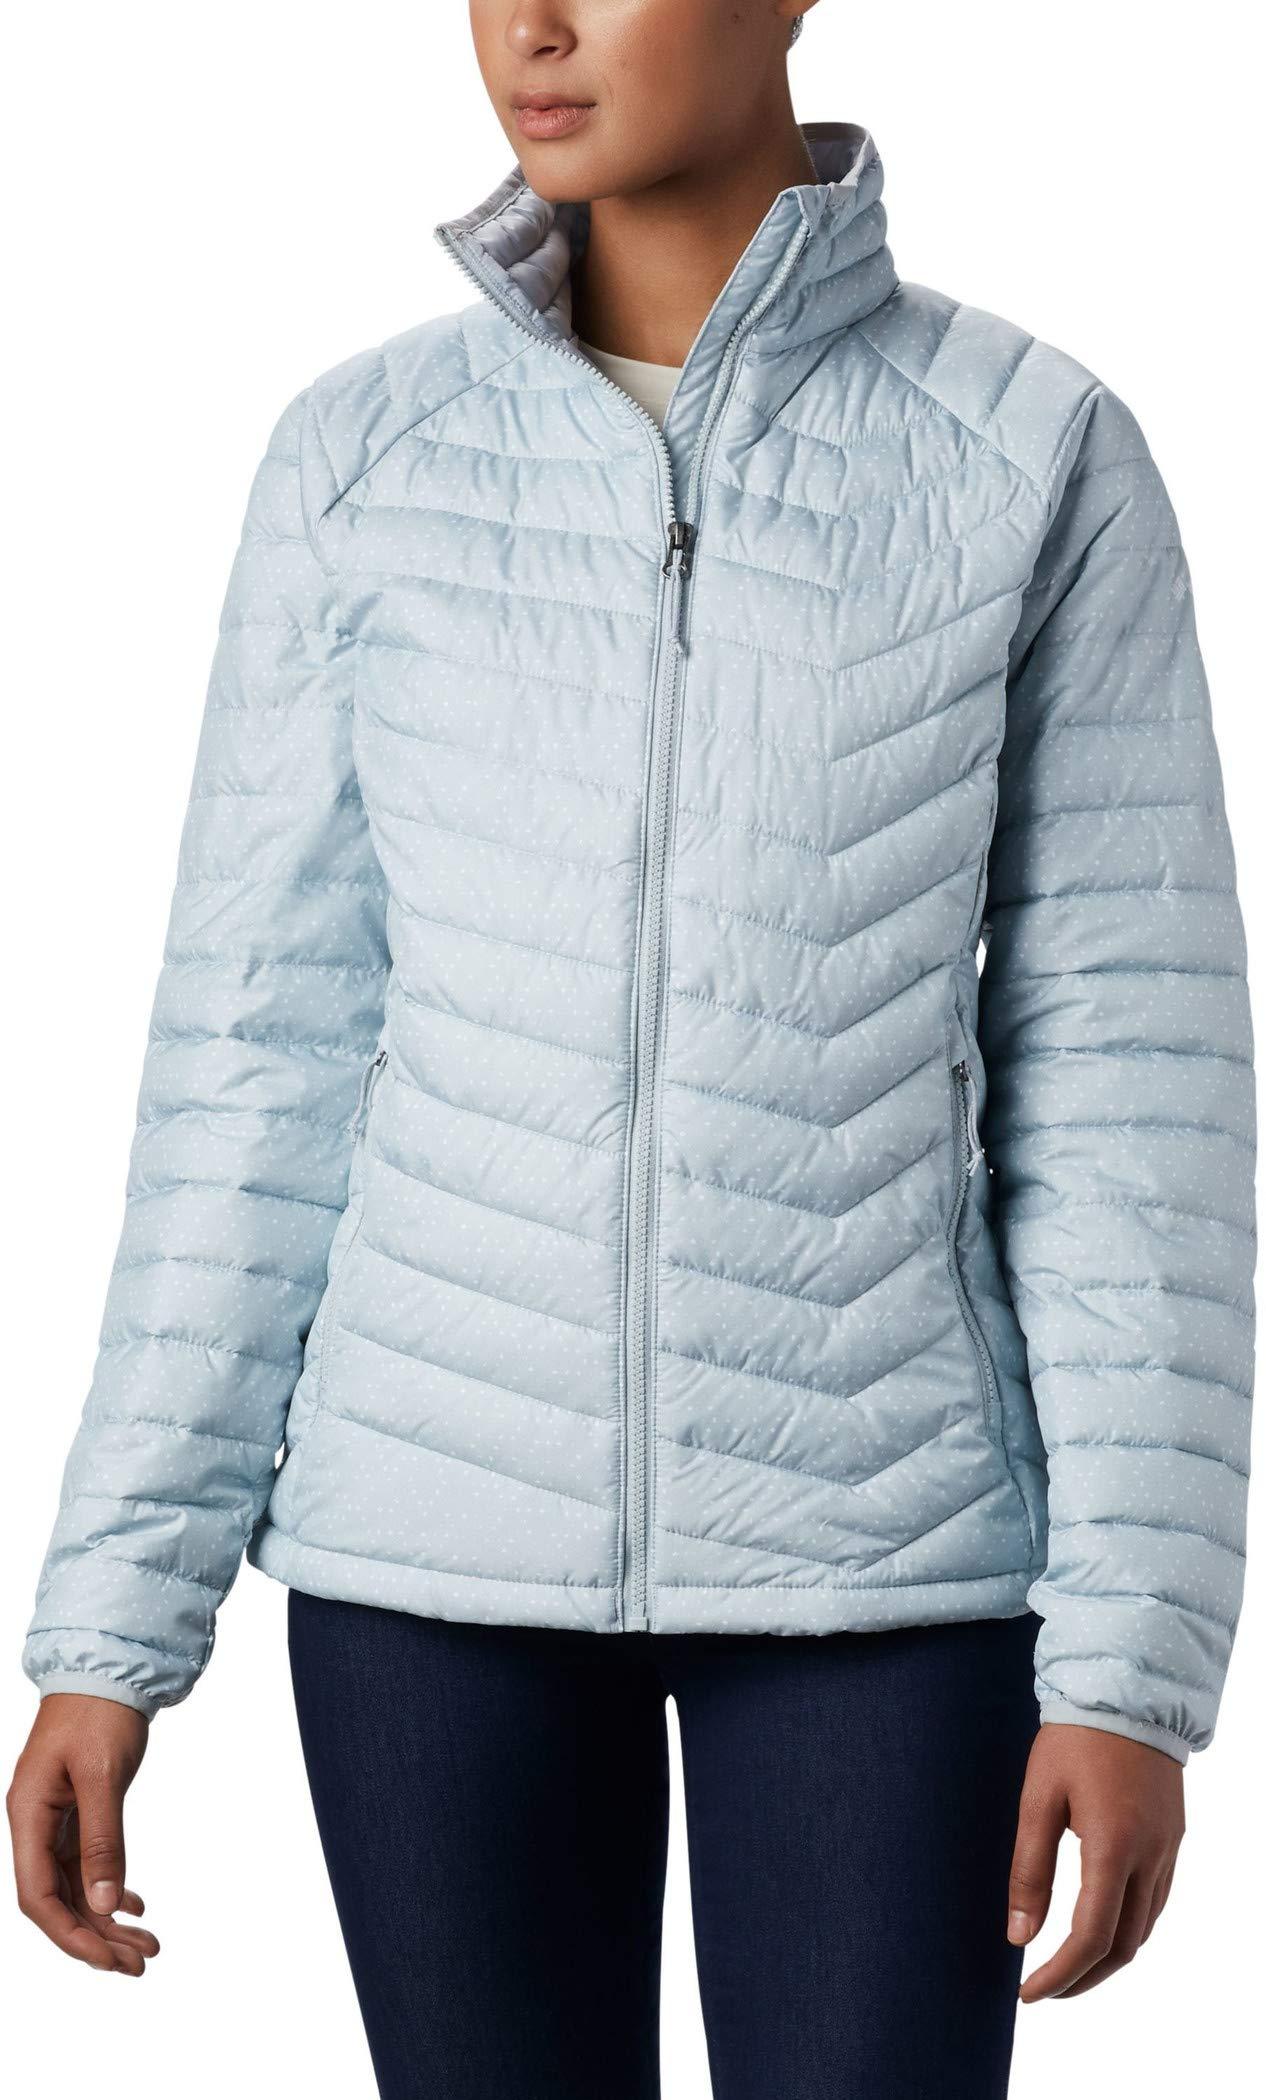 71emI29creL - Columbia Women's Powder Lite Jacket